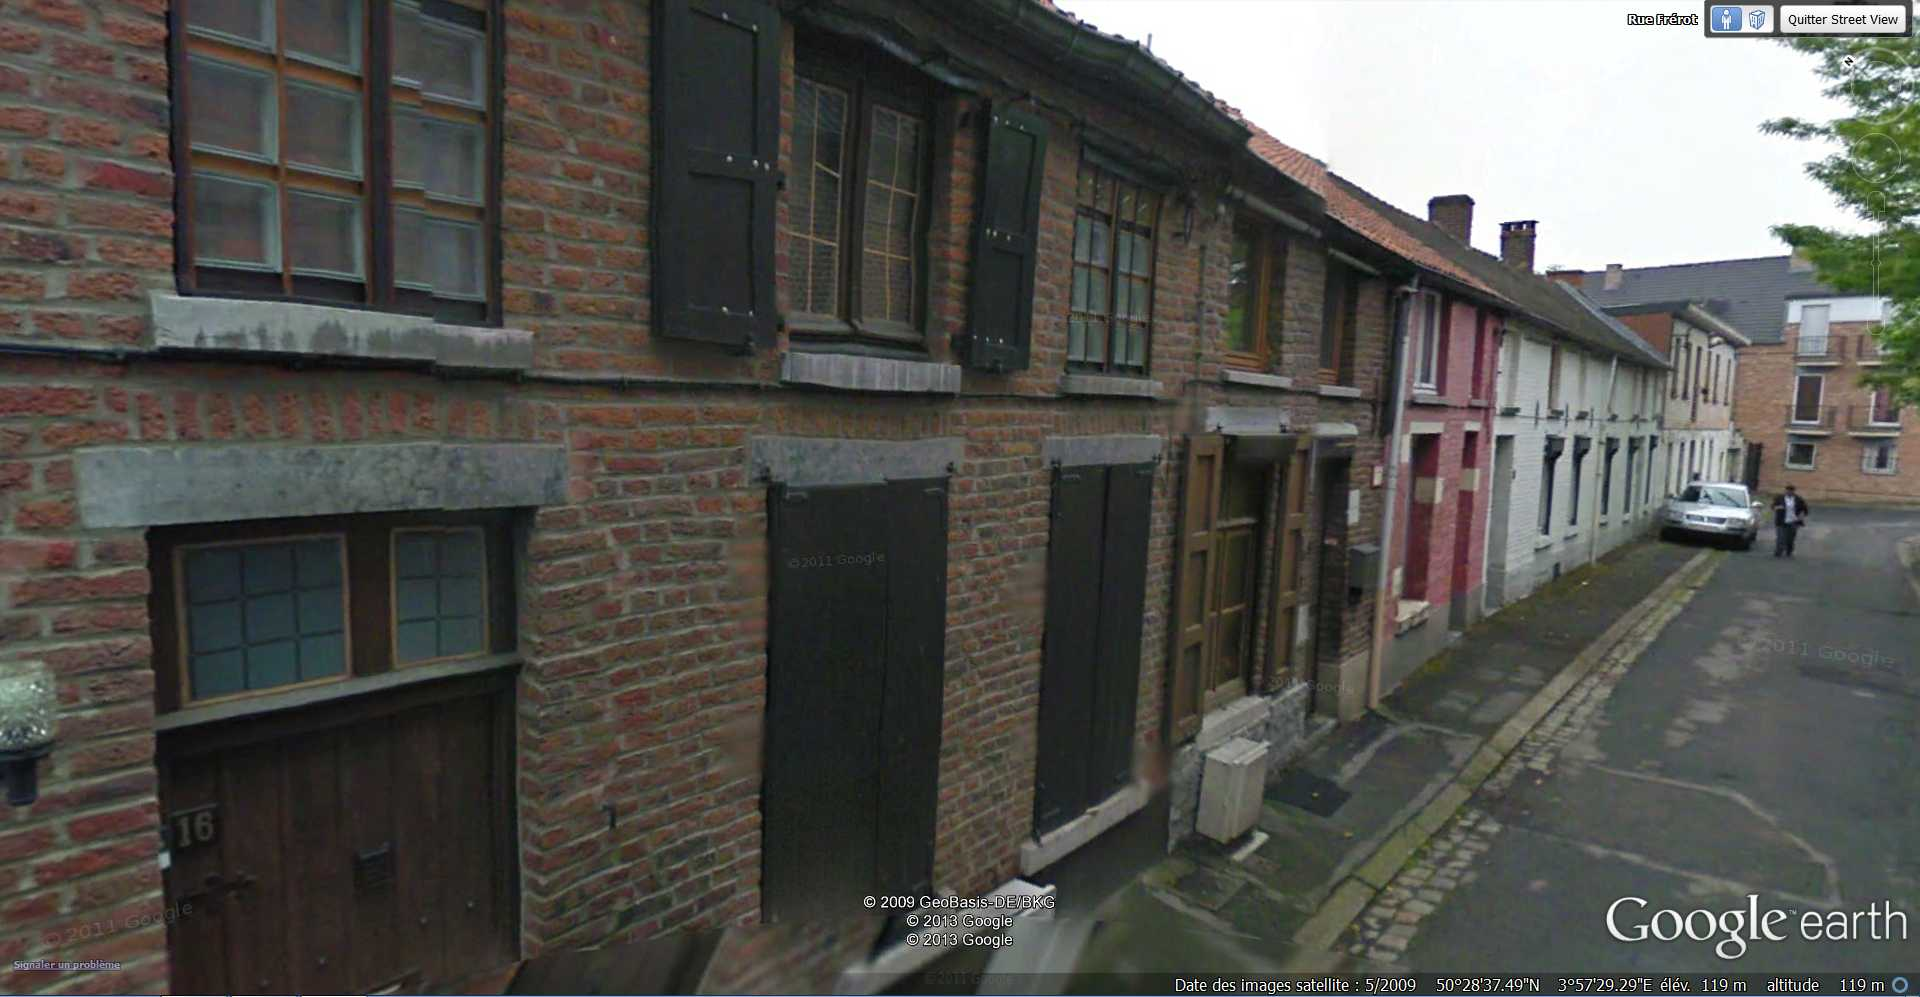 STREET VIEW : bâtiments insolites, hors normes, connus... - Page 4 2013-248